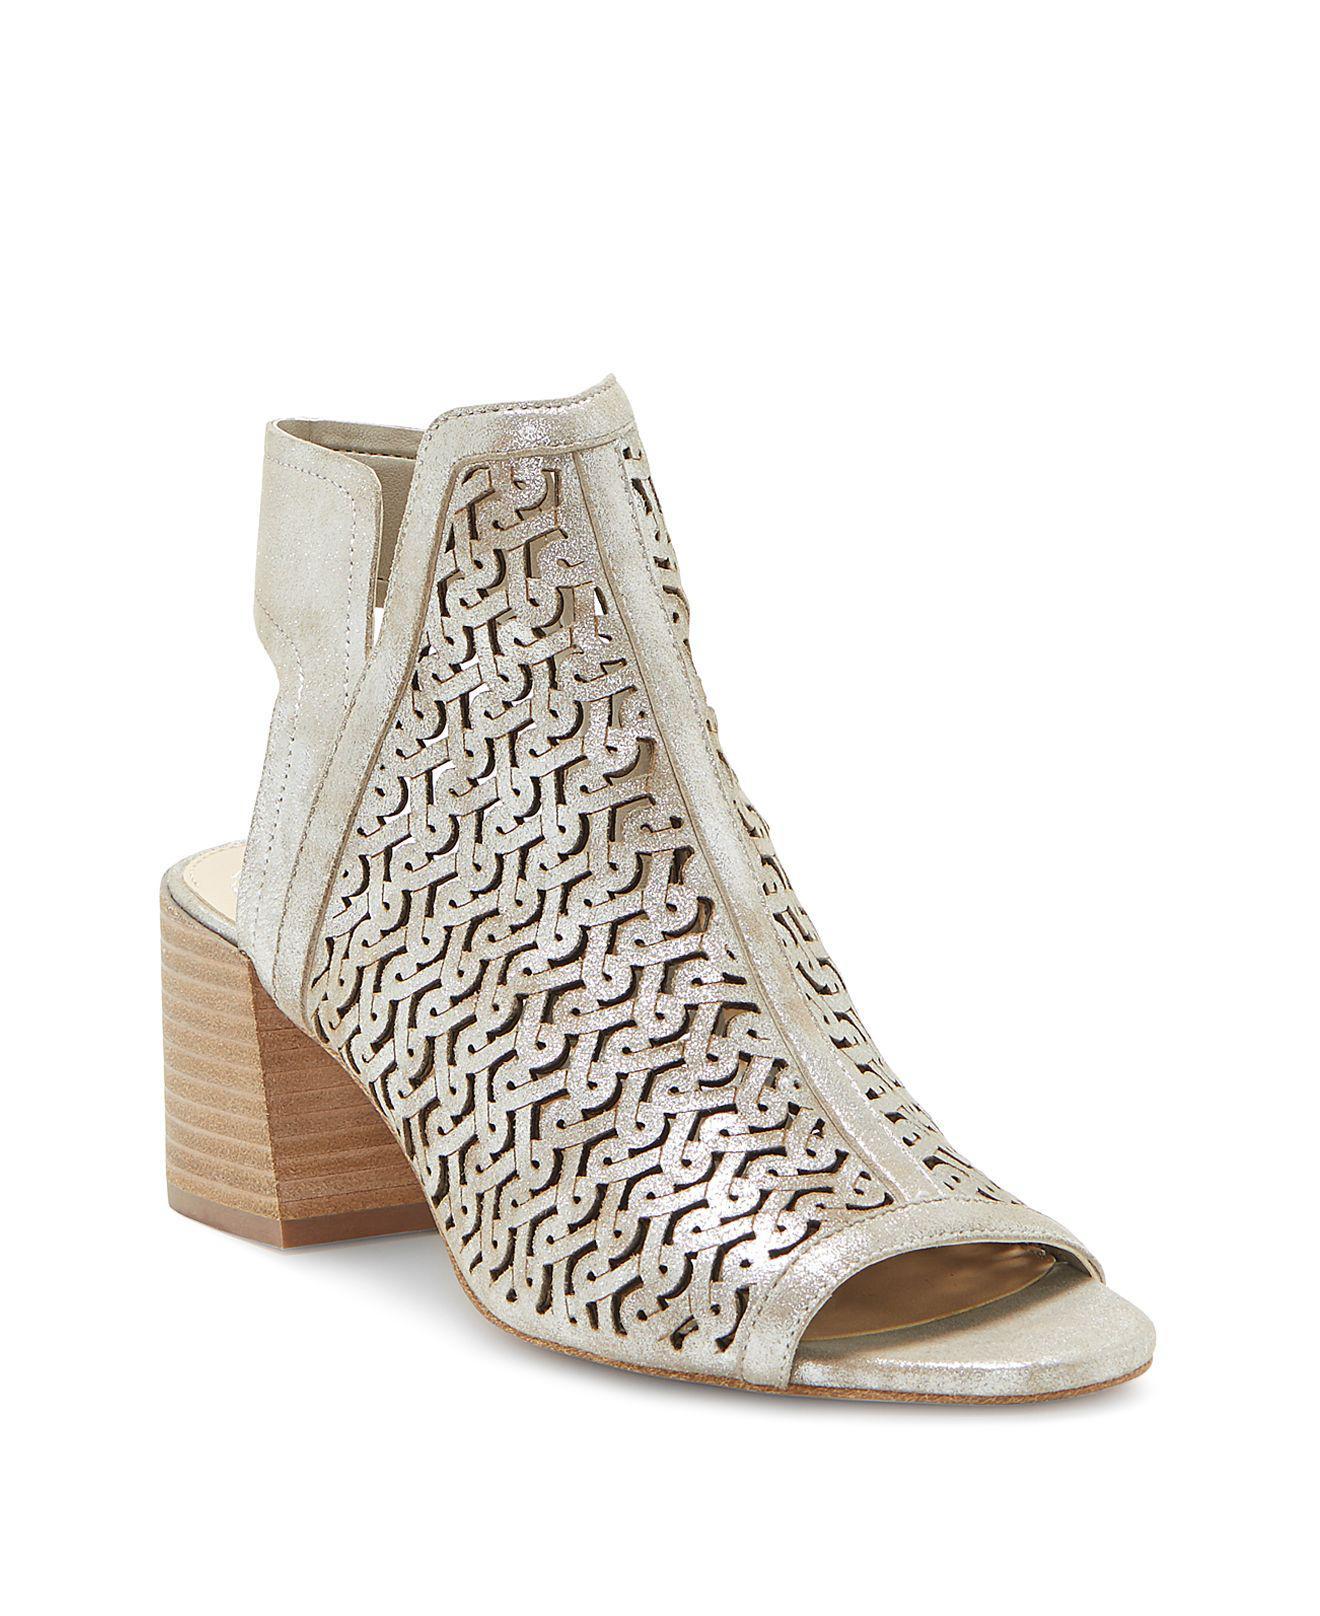 Vince Camuto Women's Sternat Sandal